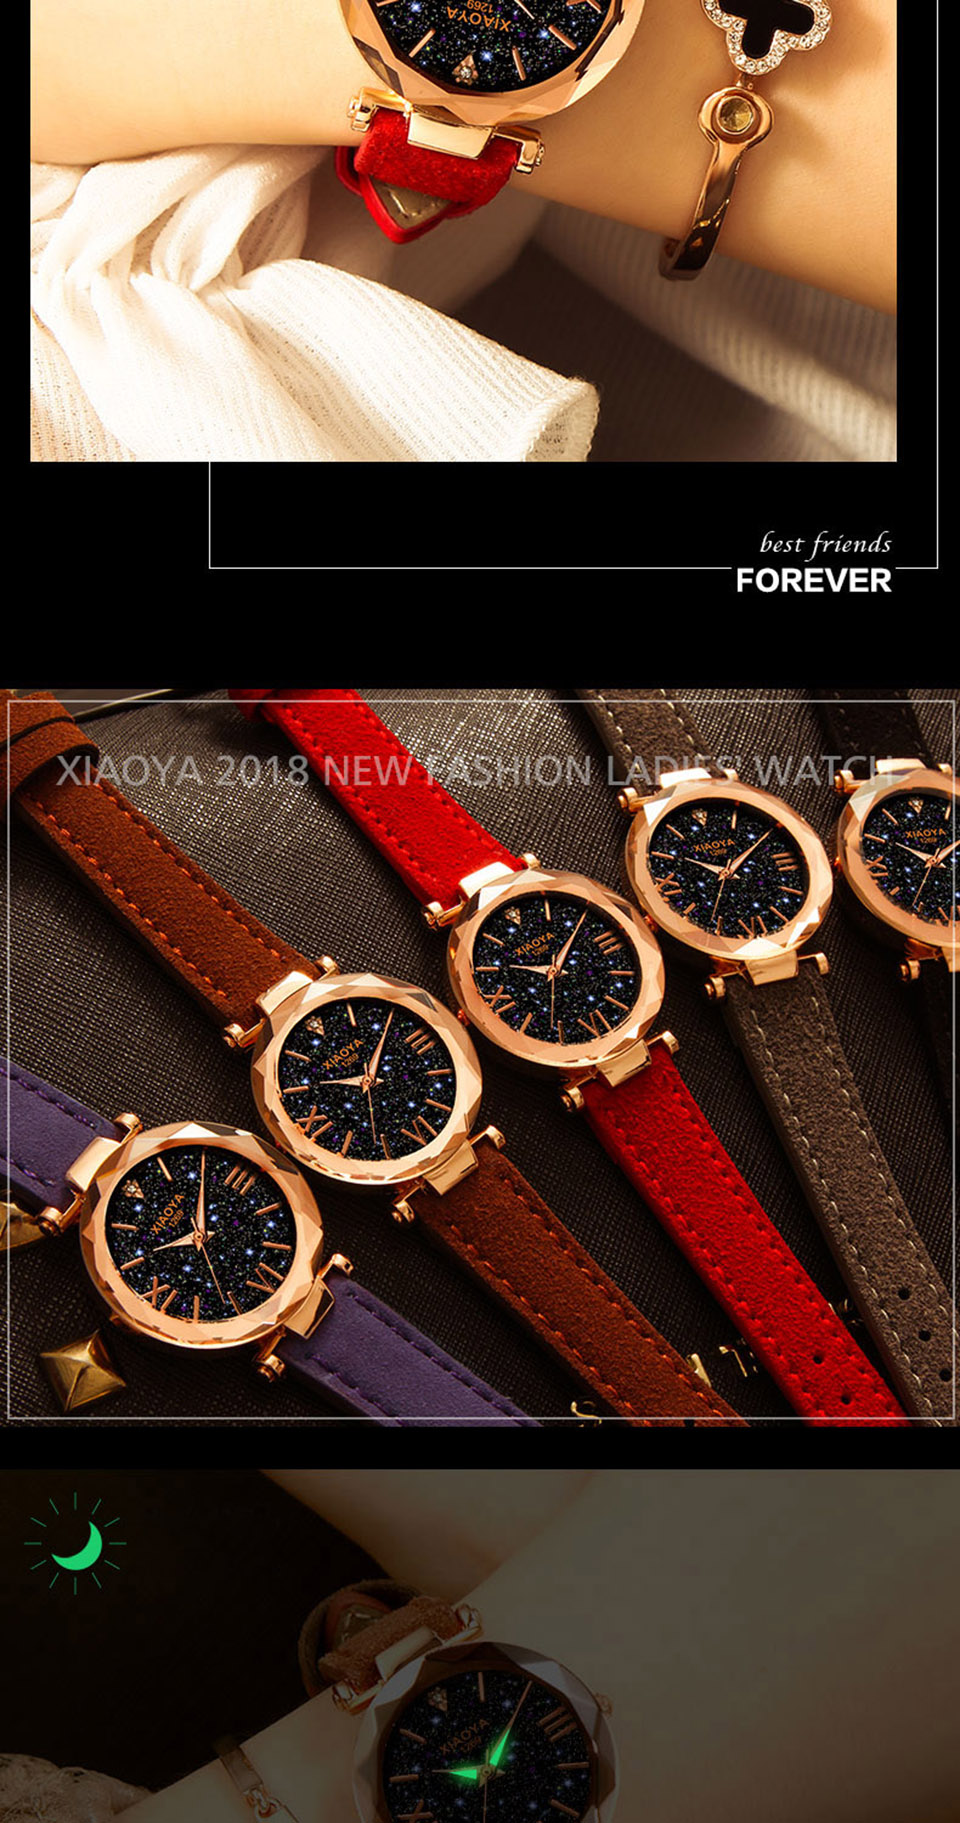 2018 Starry Sky Watch Women Minimalist Top Brand Luxury Wrist Watch For Ladies Female Clock Damski Montre Femme (3)